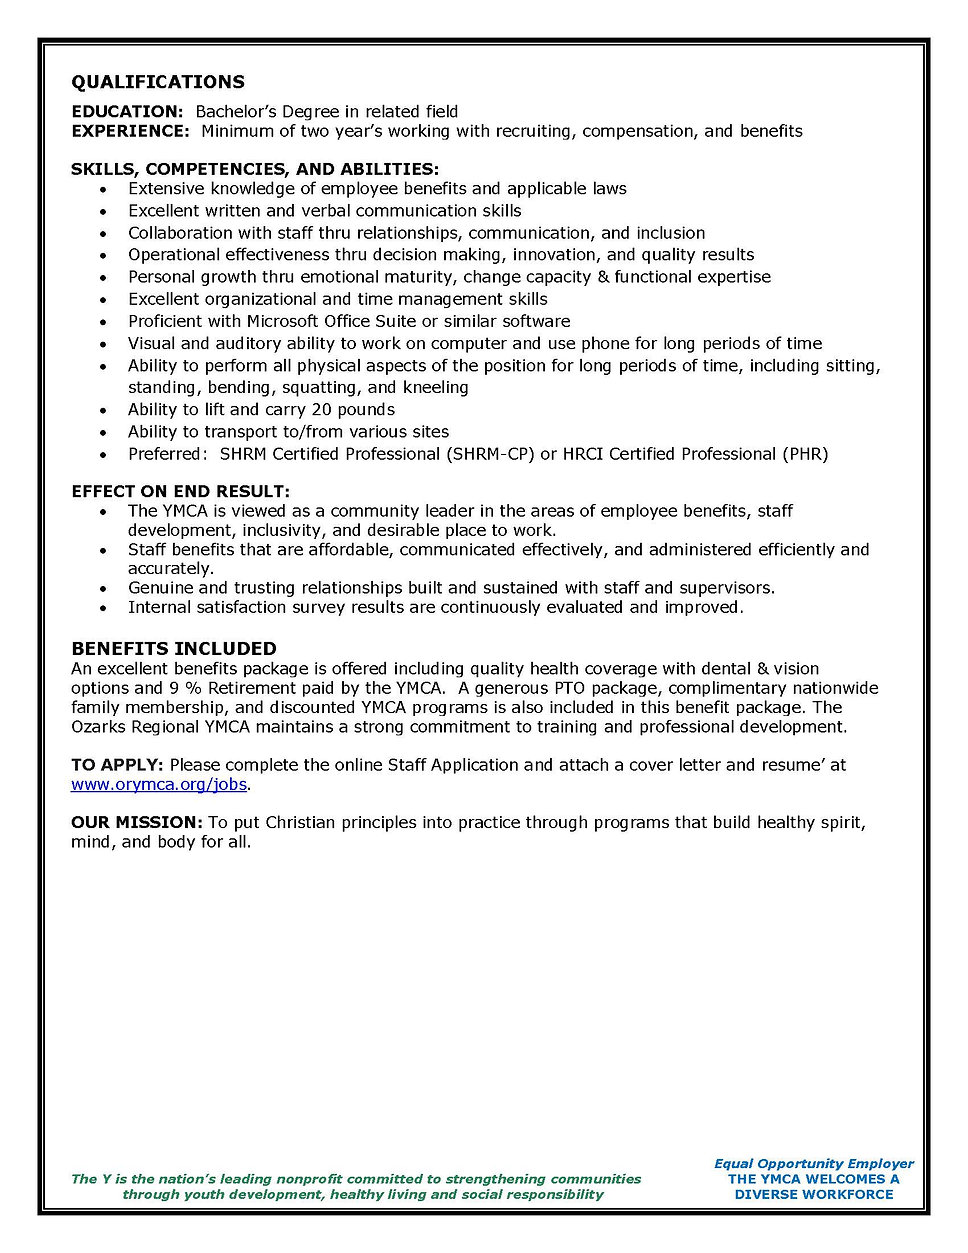 HR_FT_Benefist_Specialist_7.2020_Page_2.